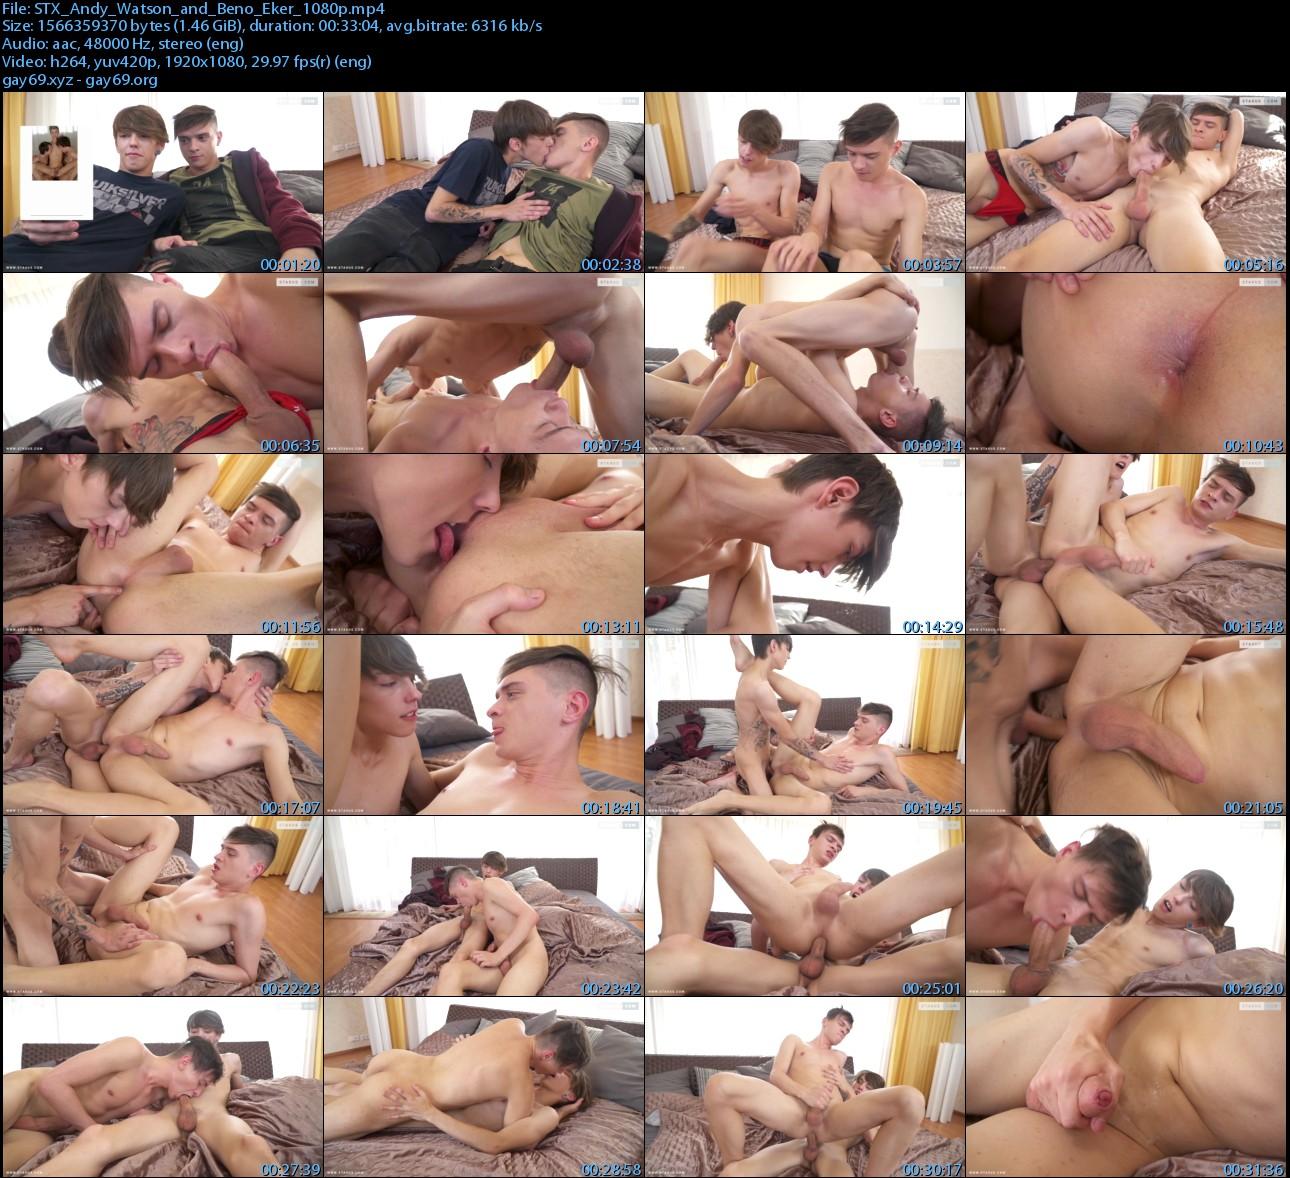 STX_Andy_Watson_and_Beno_Eker_1080p_s.jpg